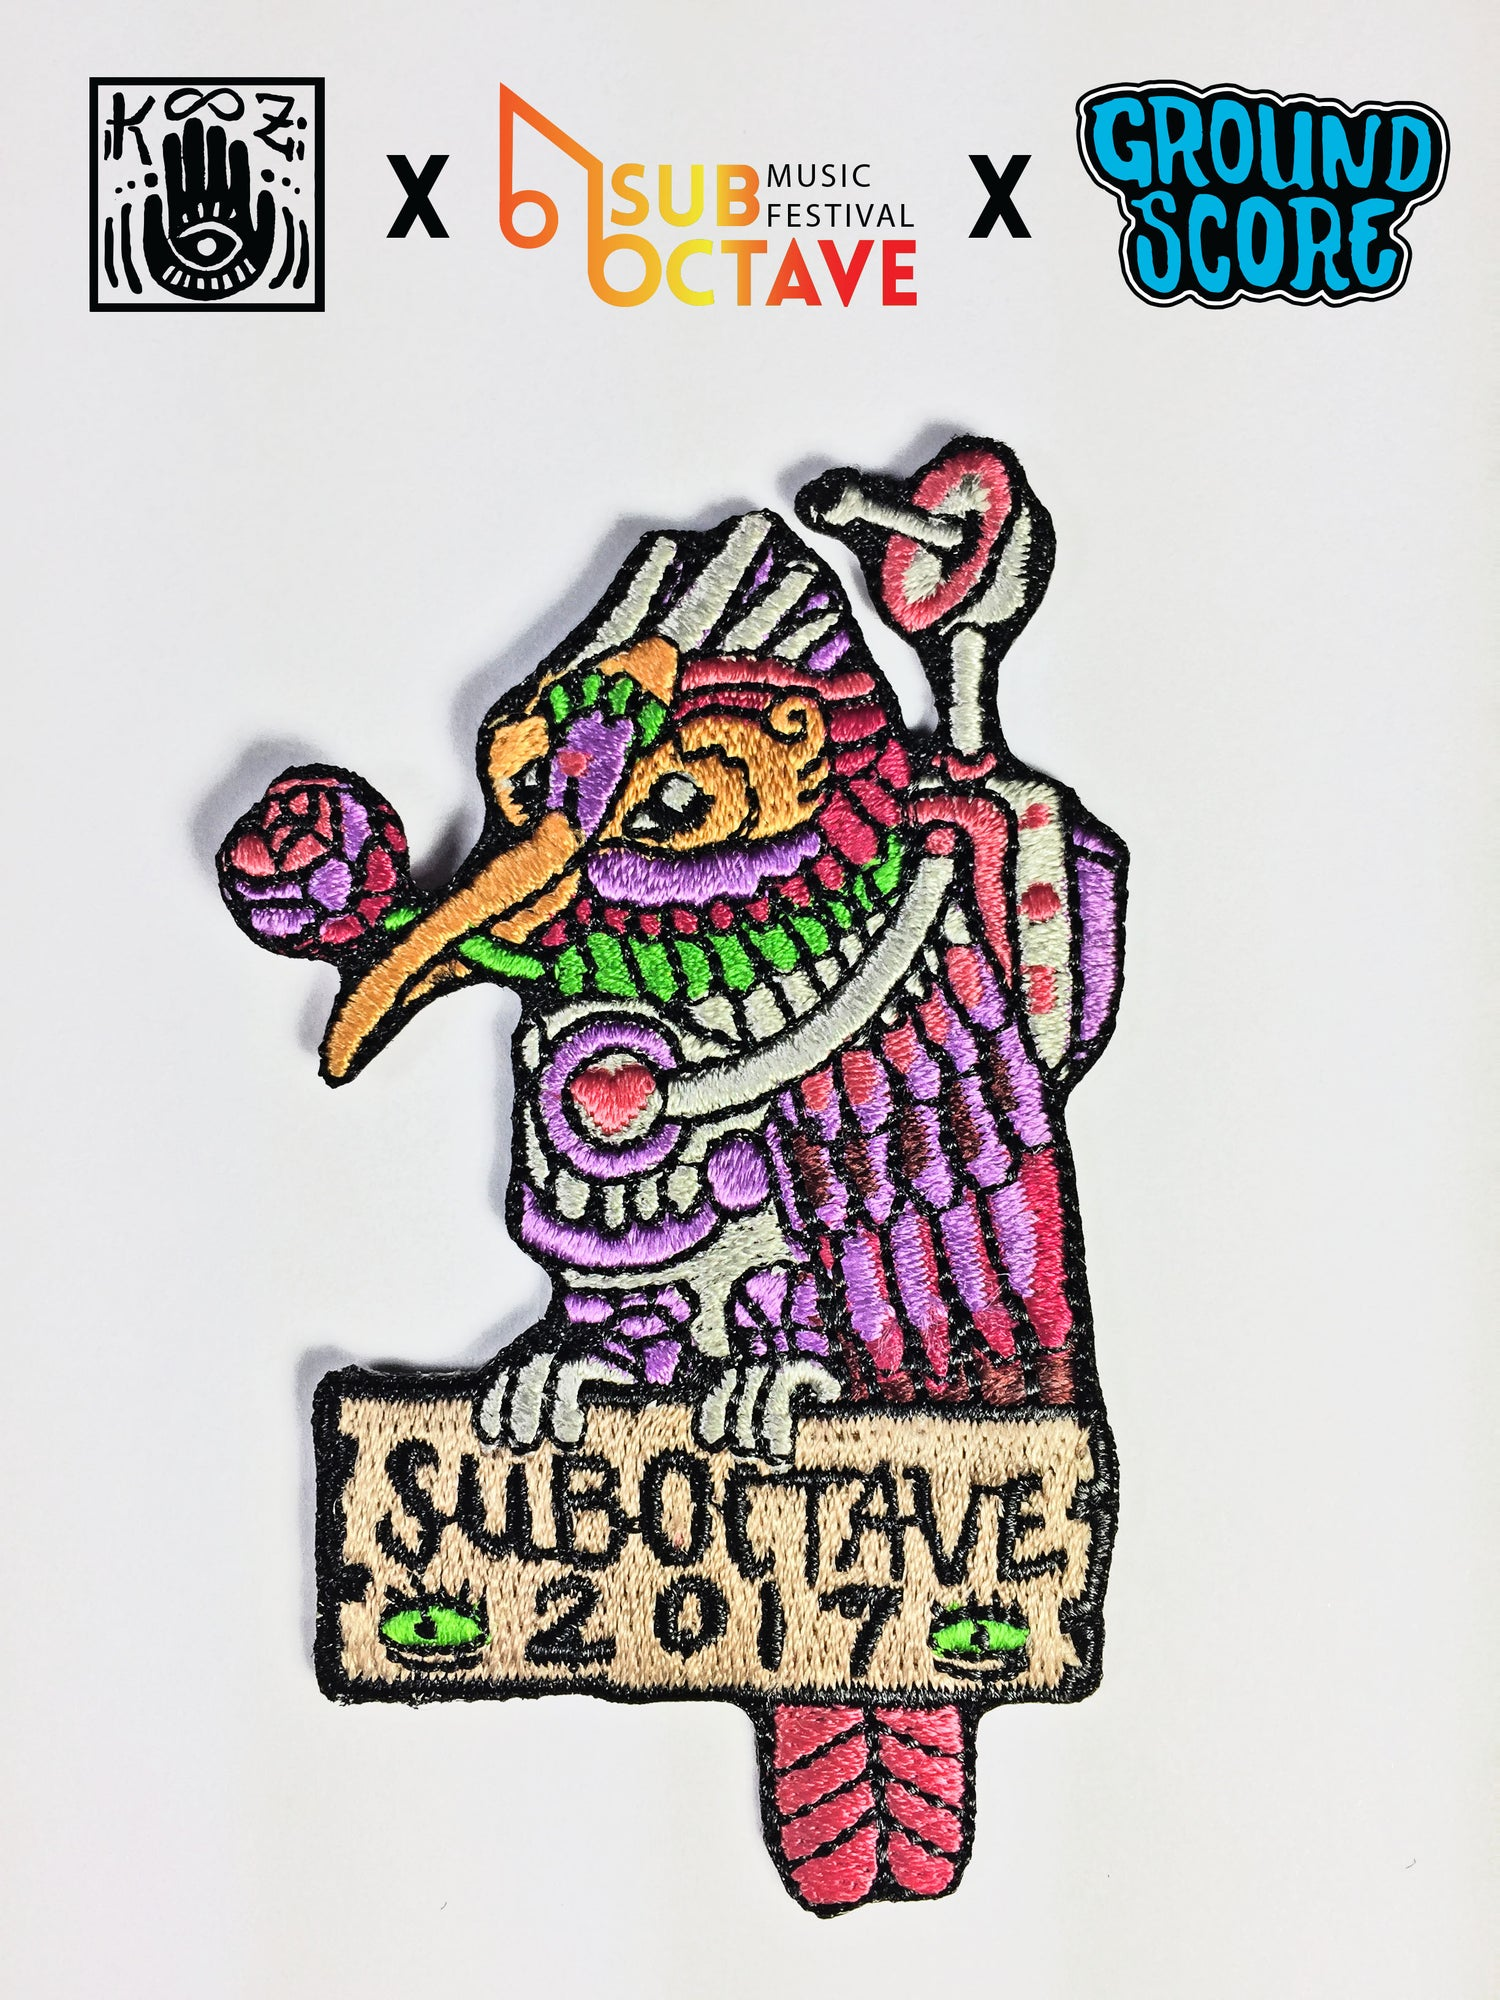 Official SubOctave Music Festival Patch